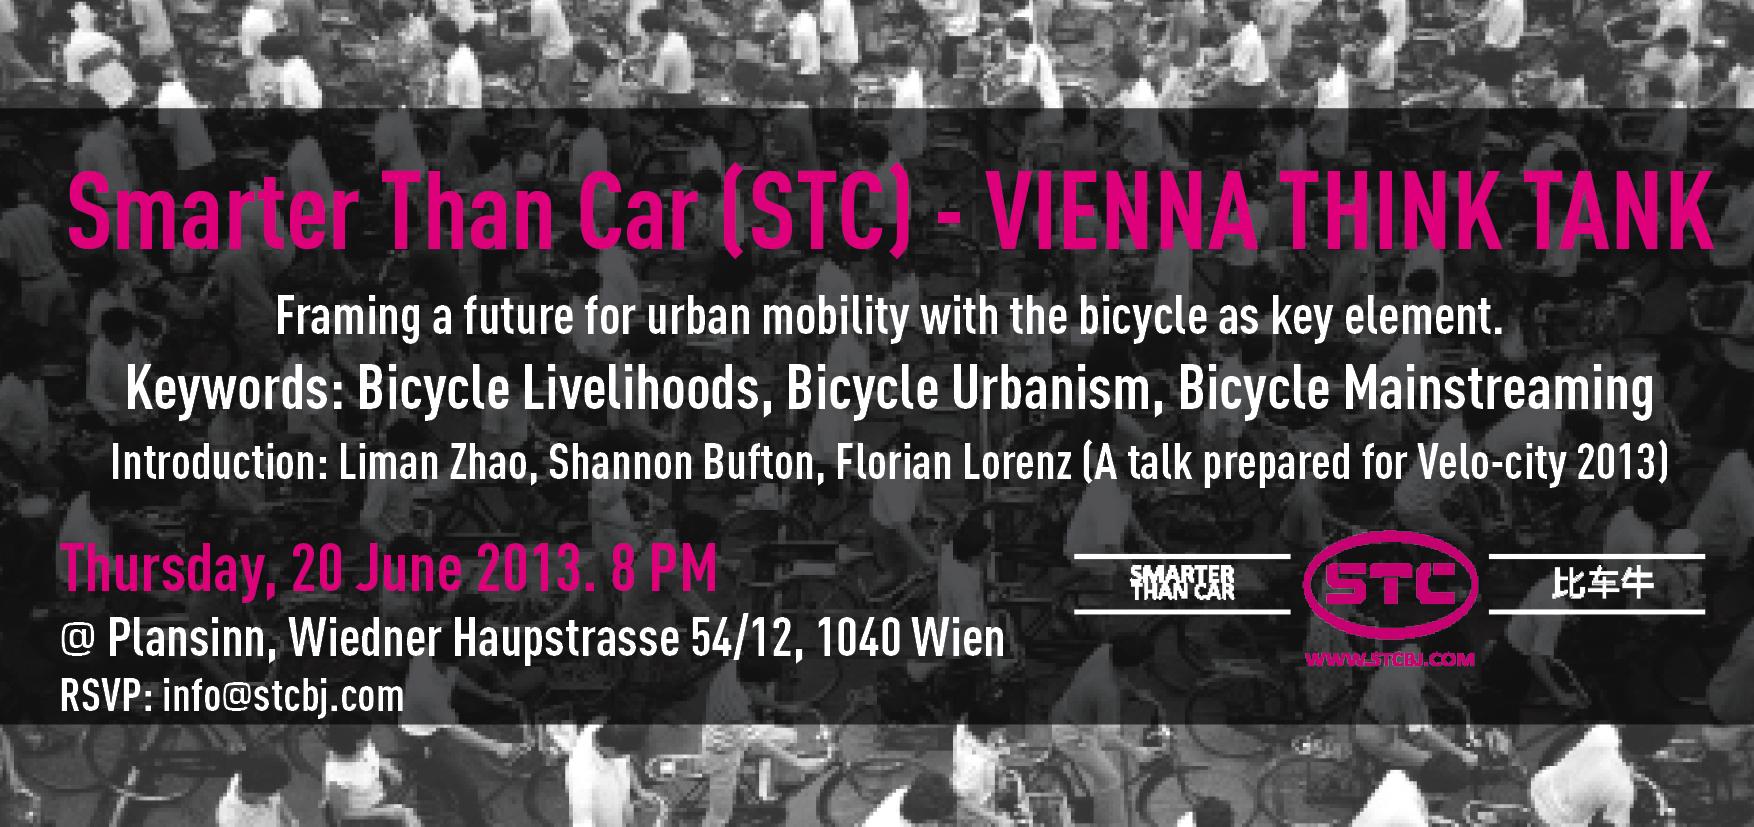 STC_Vienna Think Tank 2013-06-20.jpg